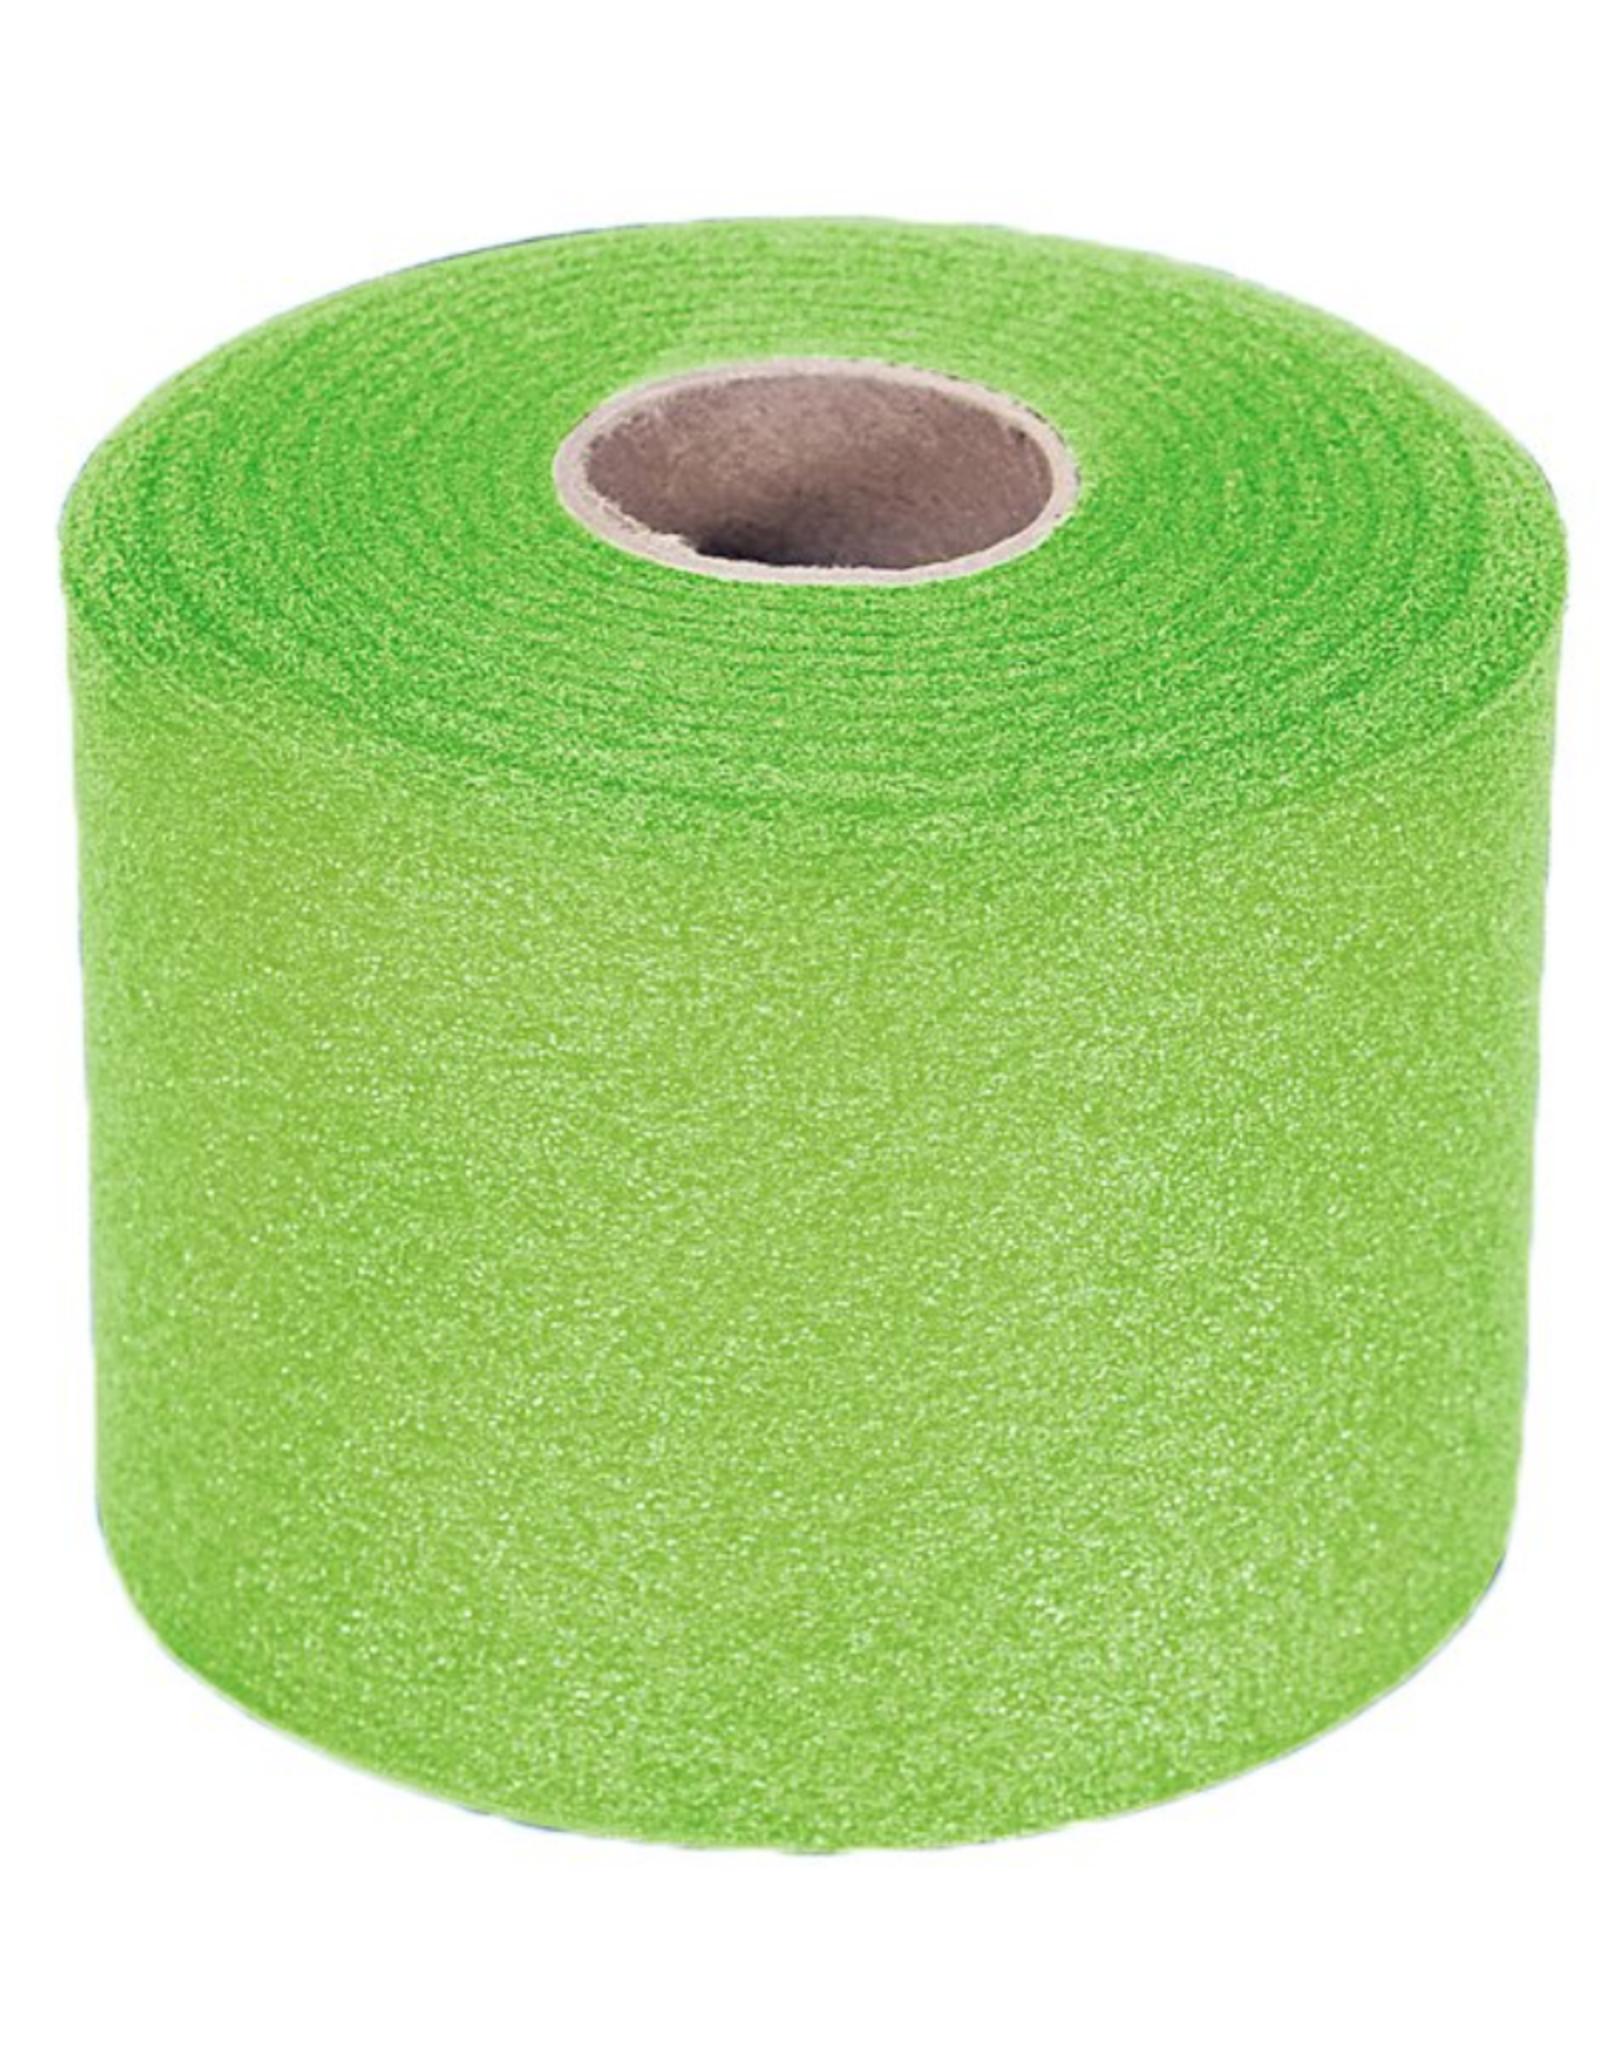 Cramer Cramer Underwrap Lime Green